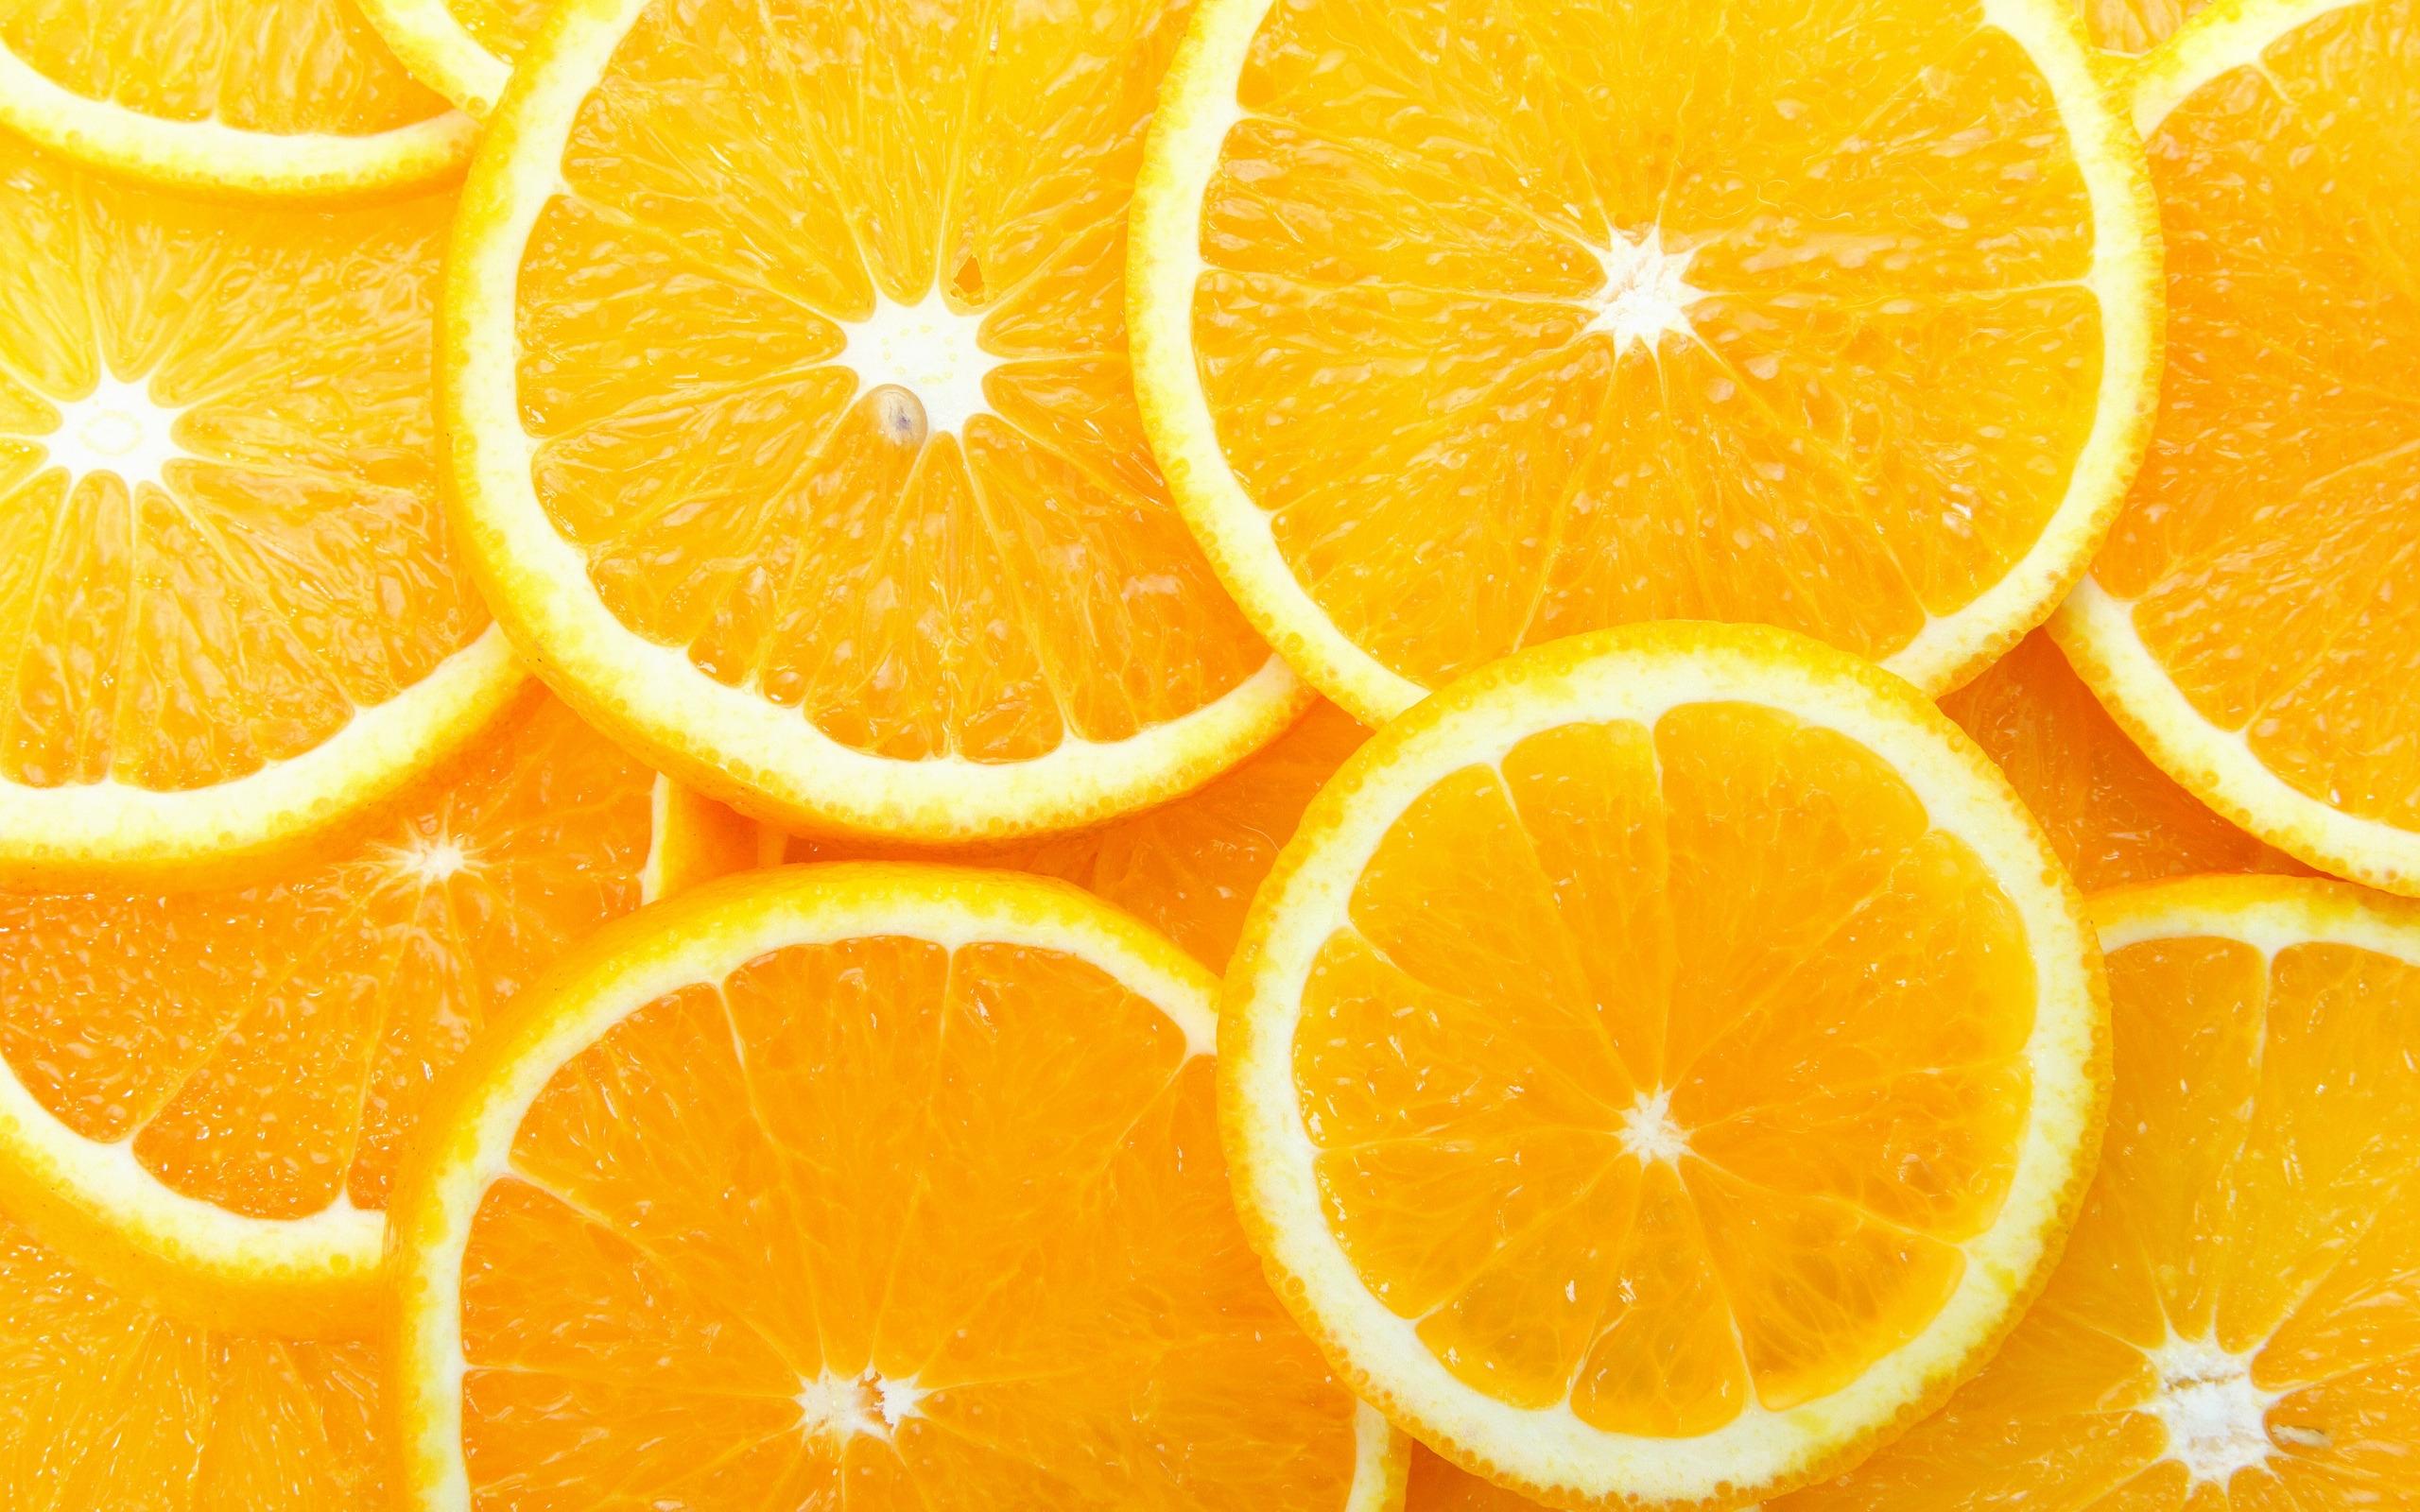 Orange Fruits Background Wallpaper Wide Wallpaper WallpaperLepi 2560x1600